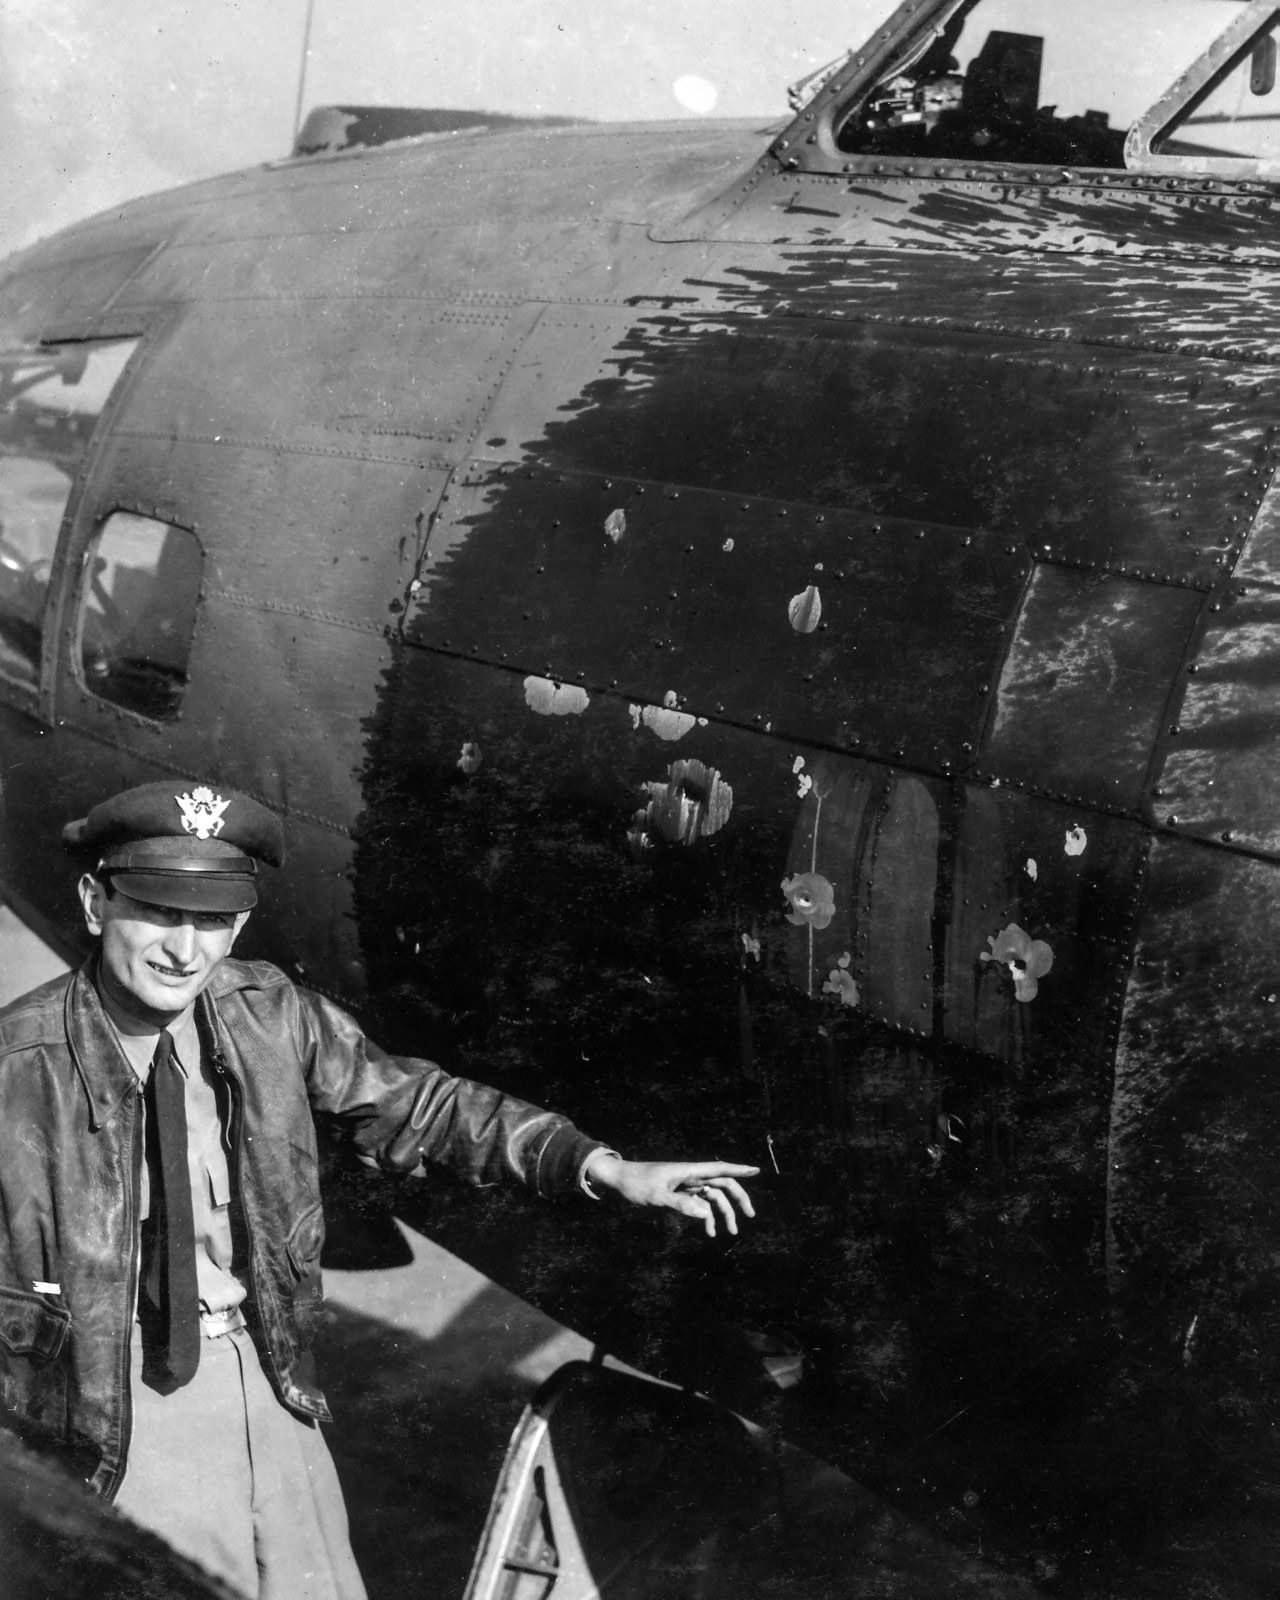 B-17 Pilot, 385th Bomb Group, England, August 17, 1943